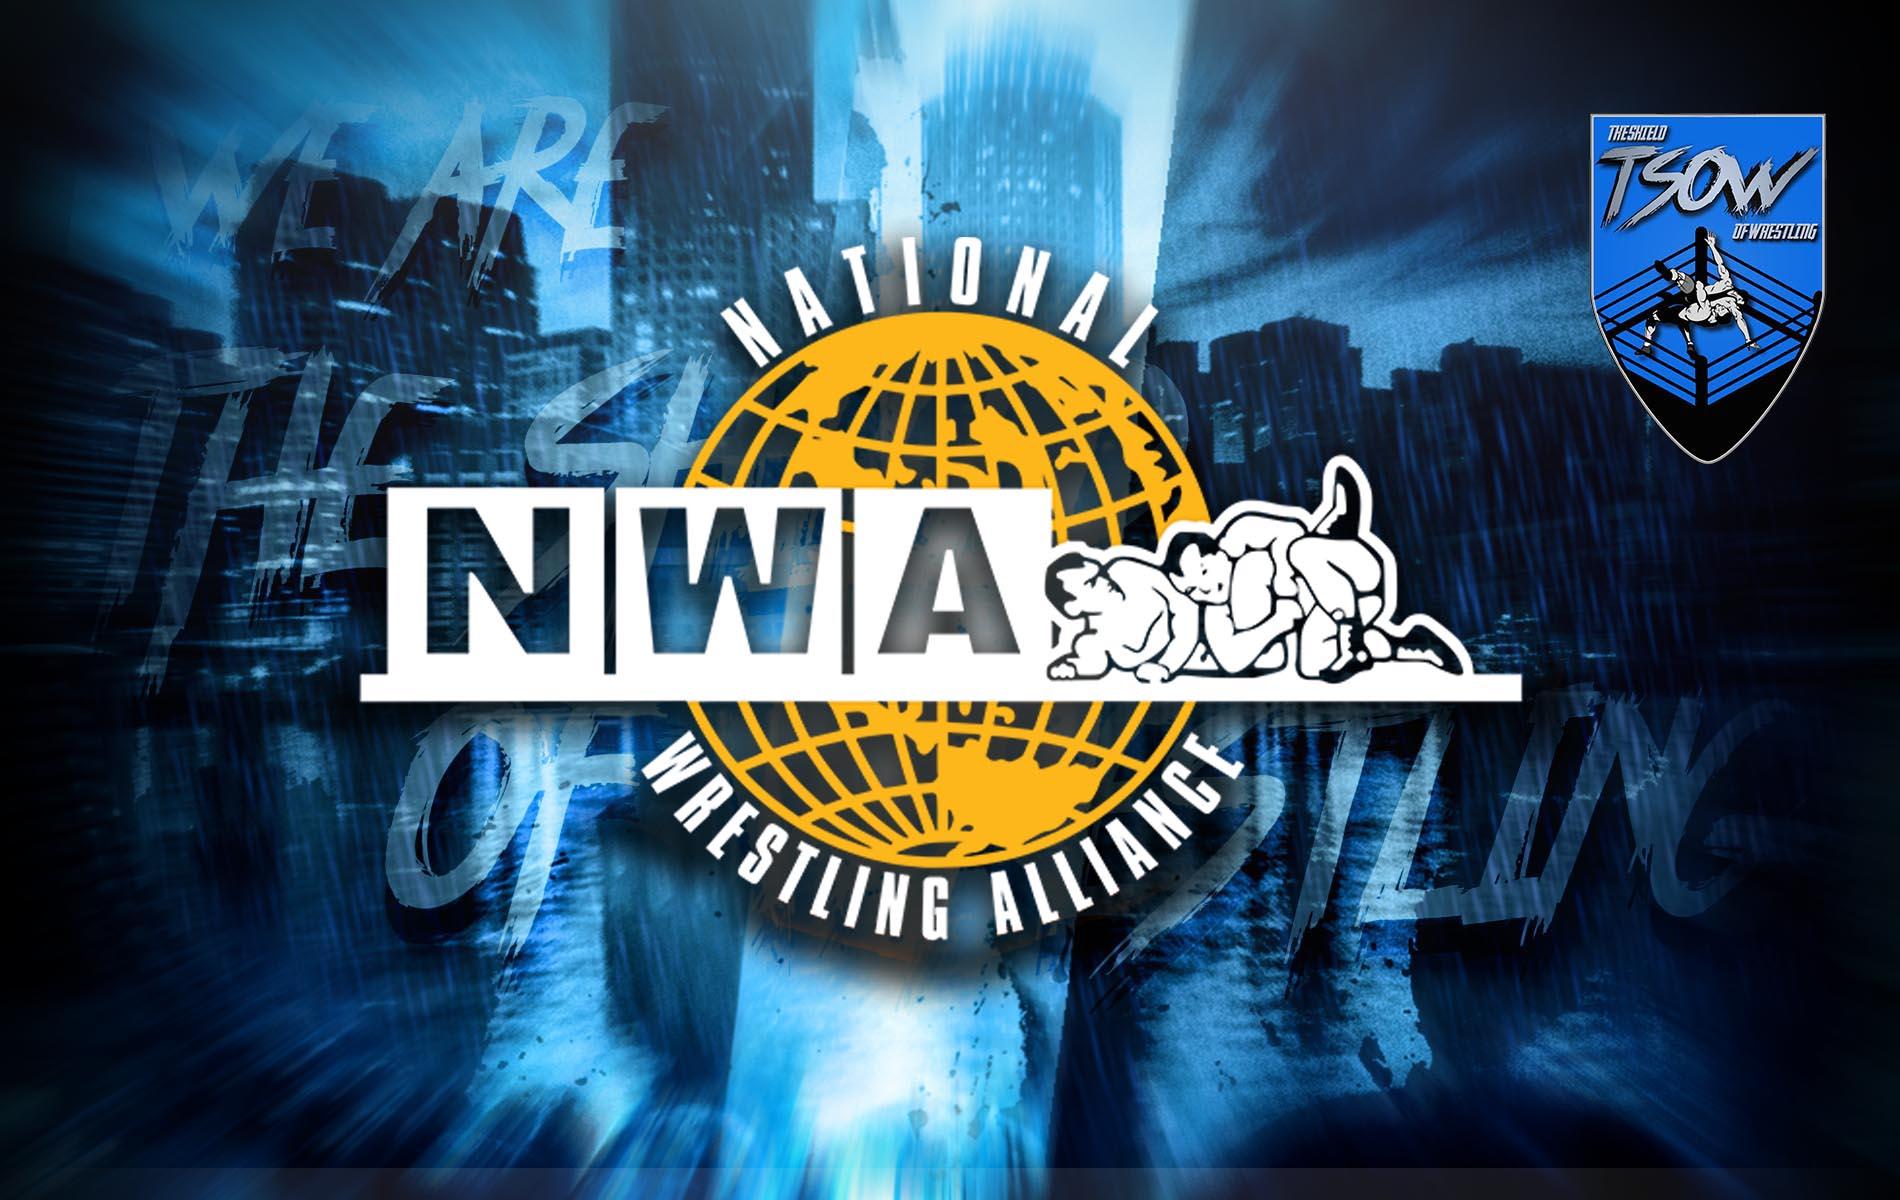 When Our Shadows Fall - I risultati del PPV NWA